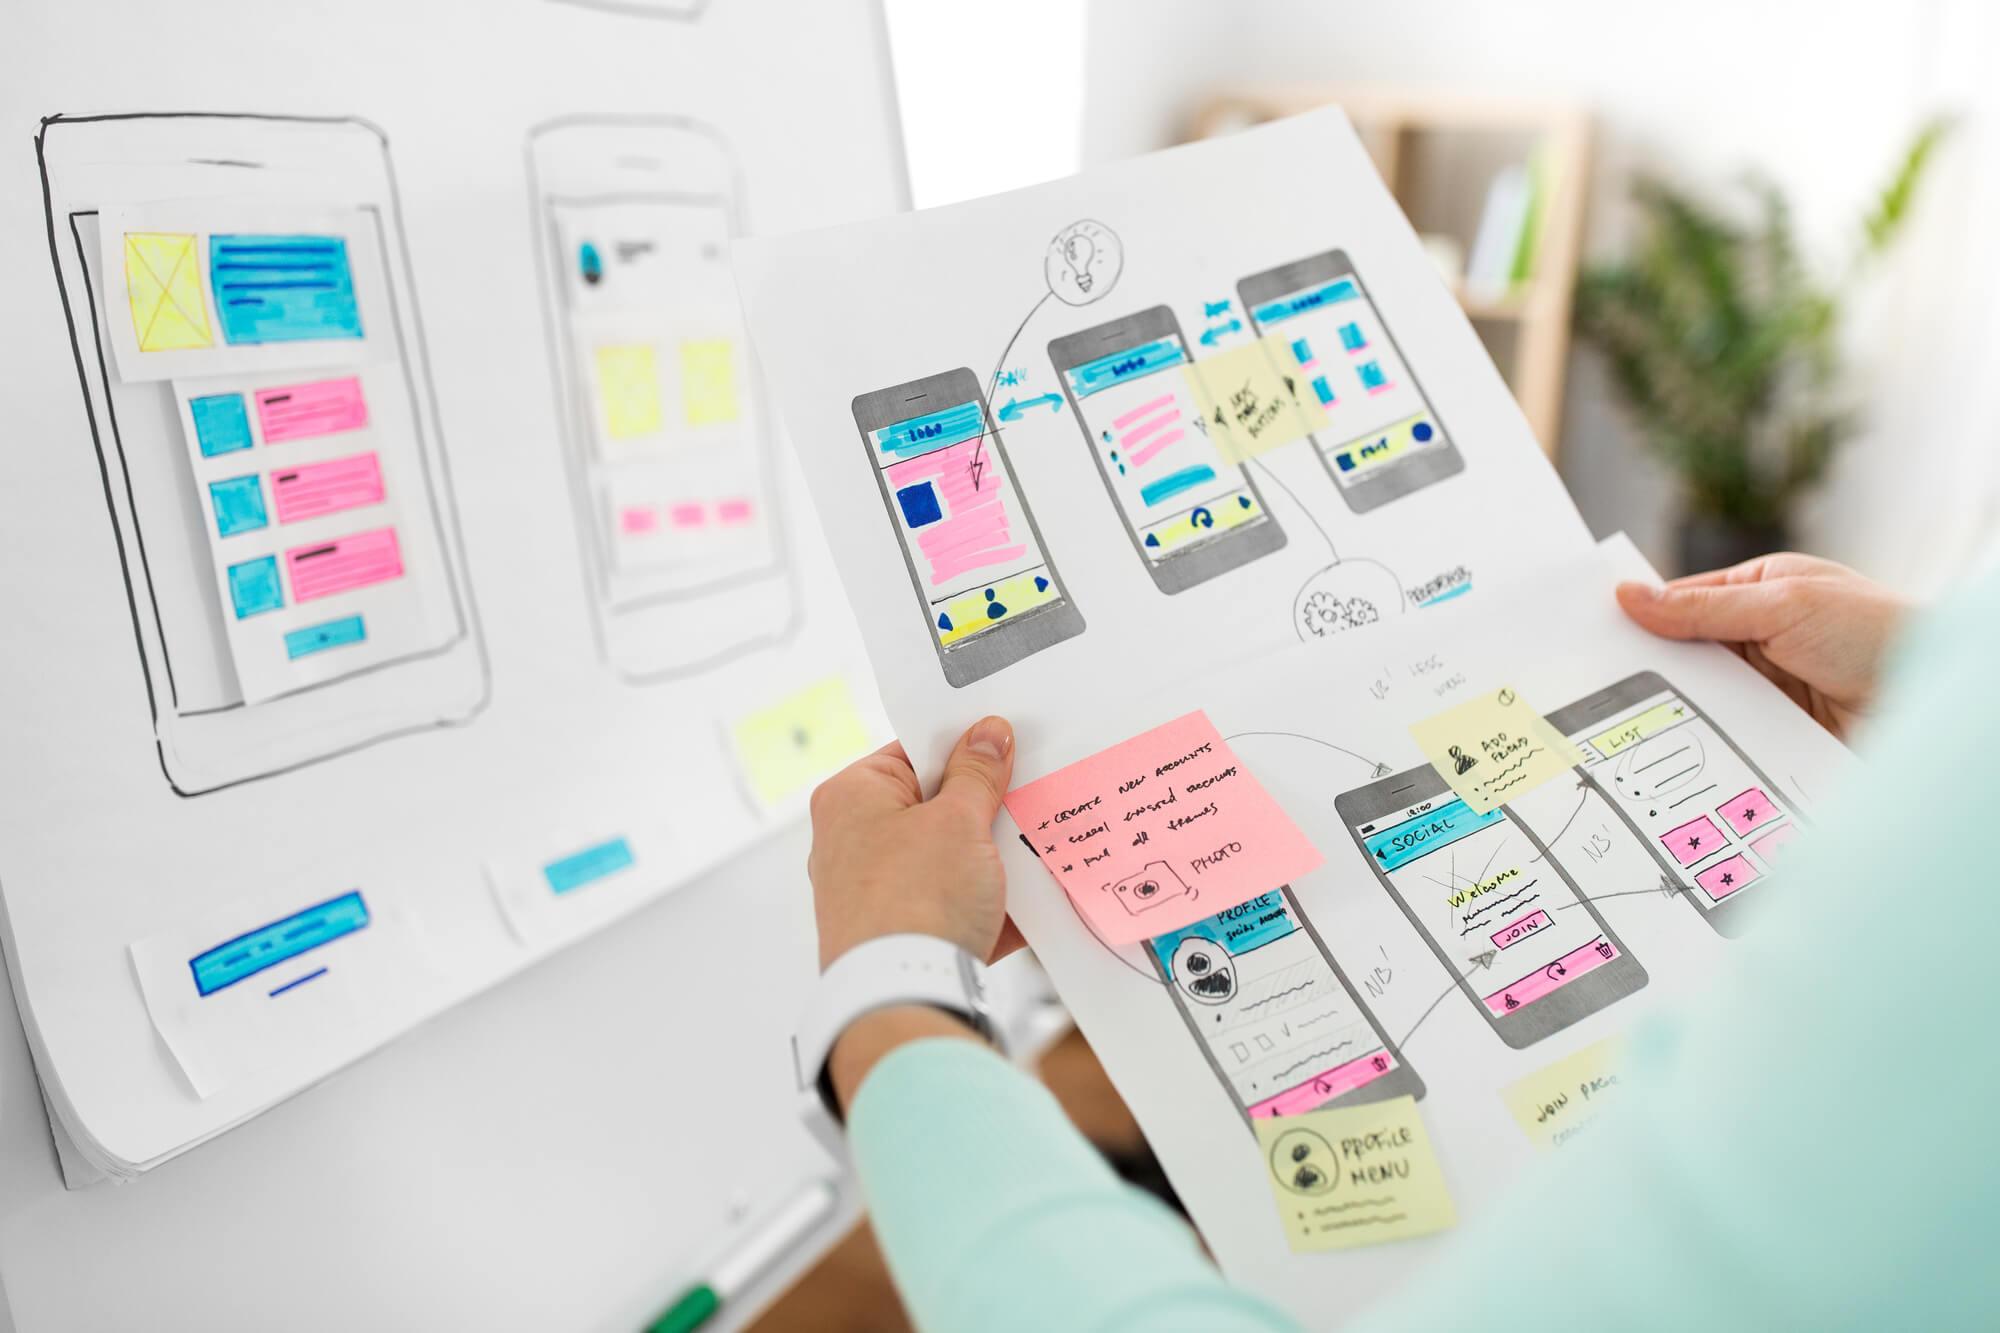 conheca-agora-as-6-principais-etapas-de-desenvolvimento-de-aplicativos.jpeg